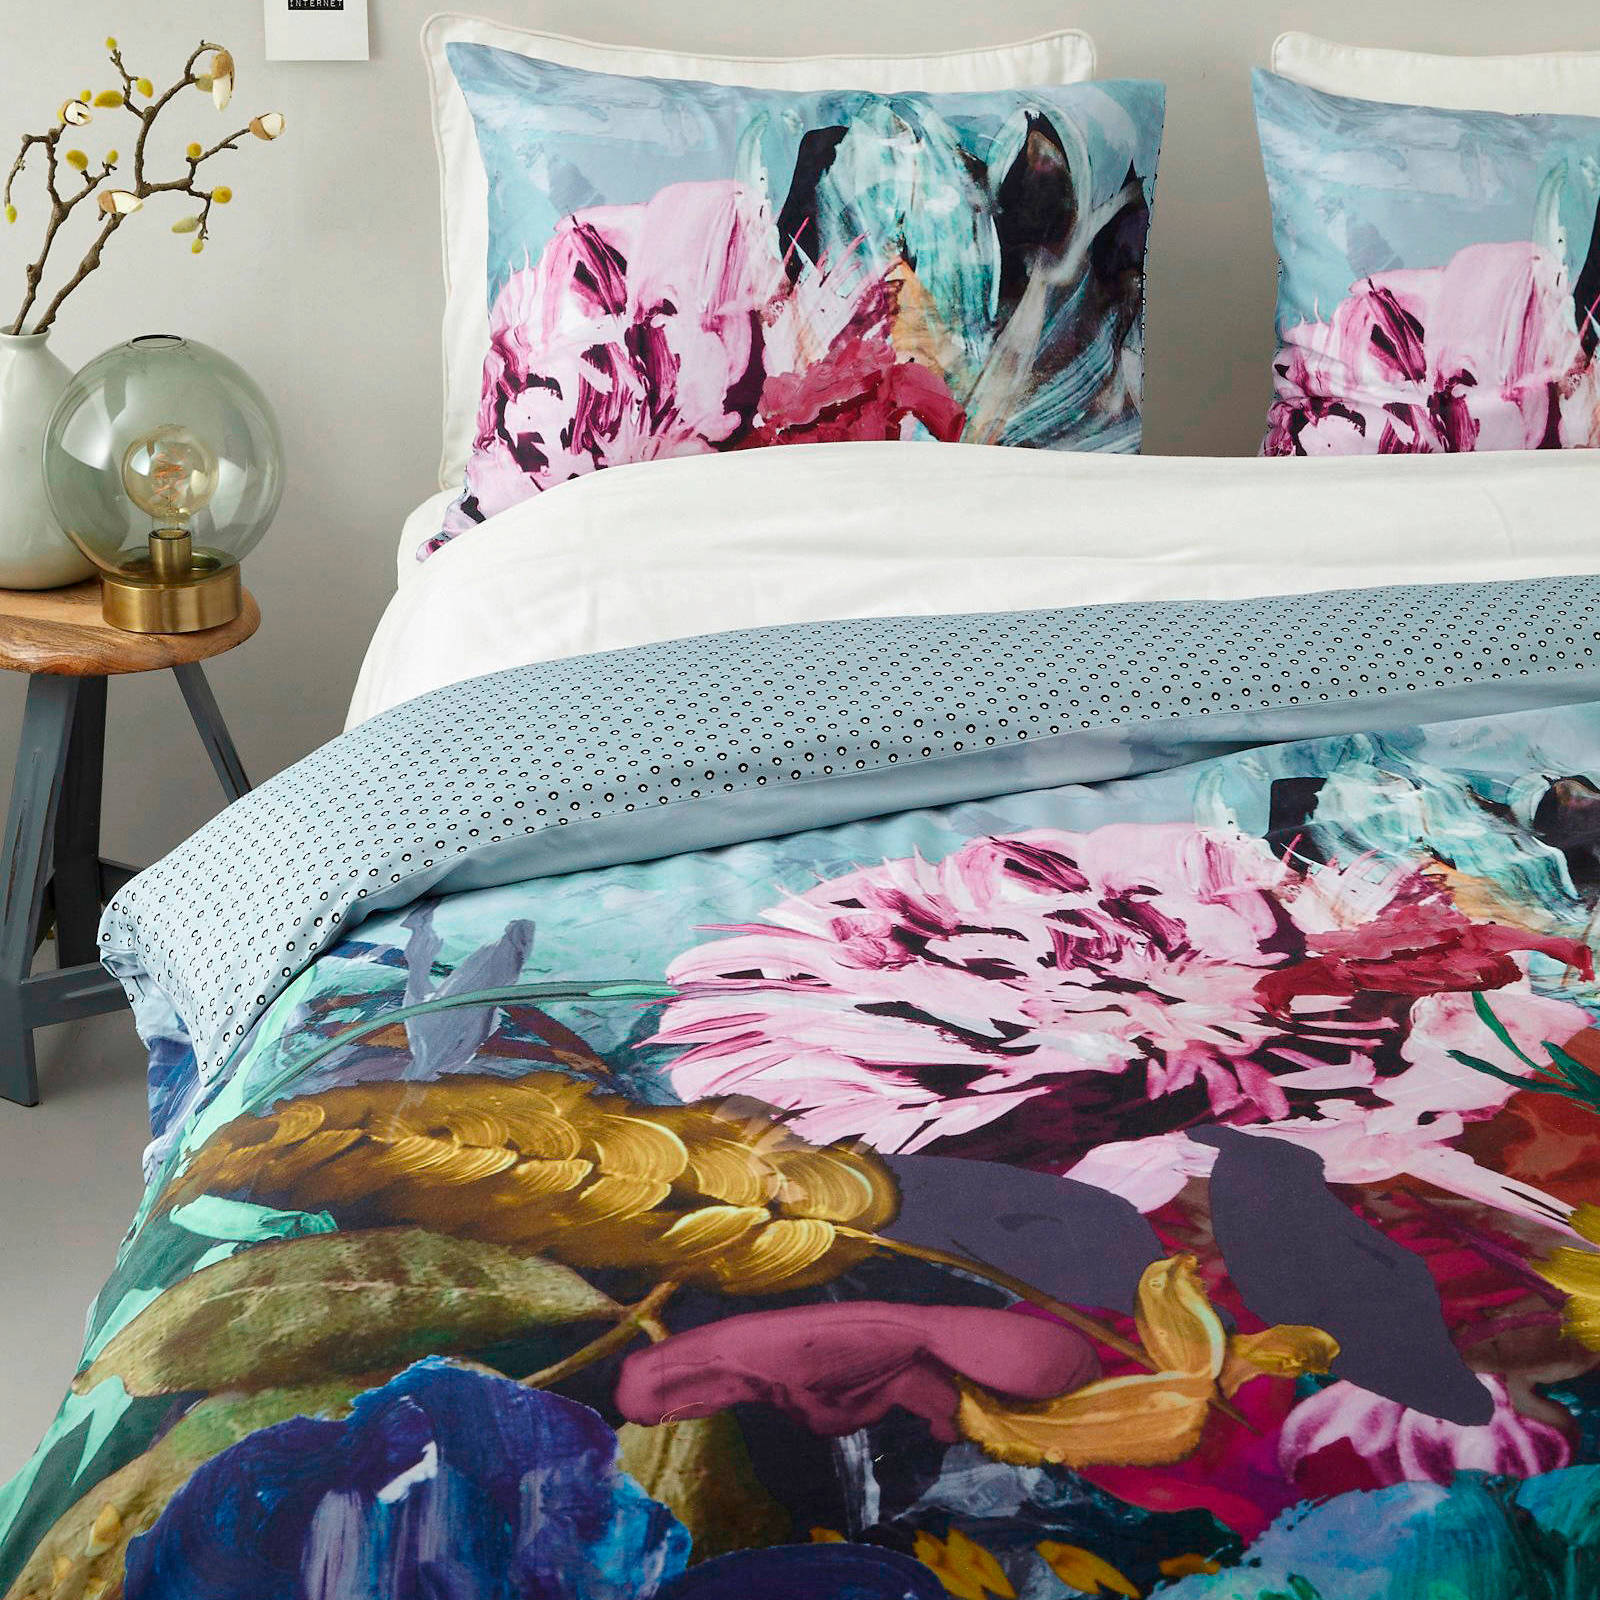 essenza katoensatijnen dekbedovertrek lits jumeaux blauw